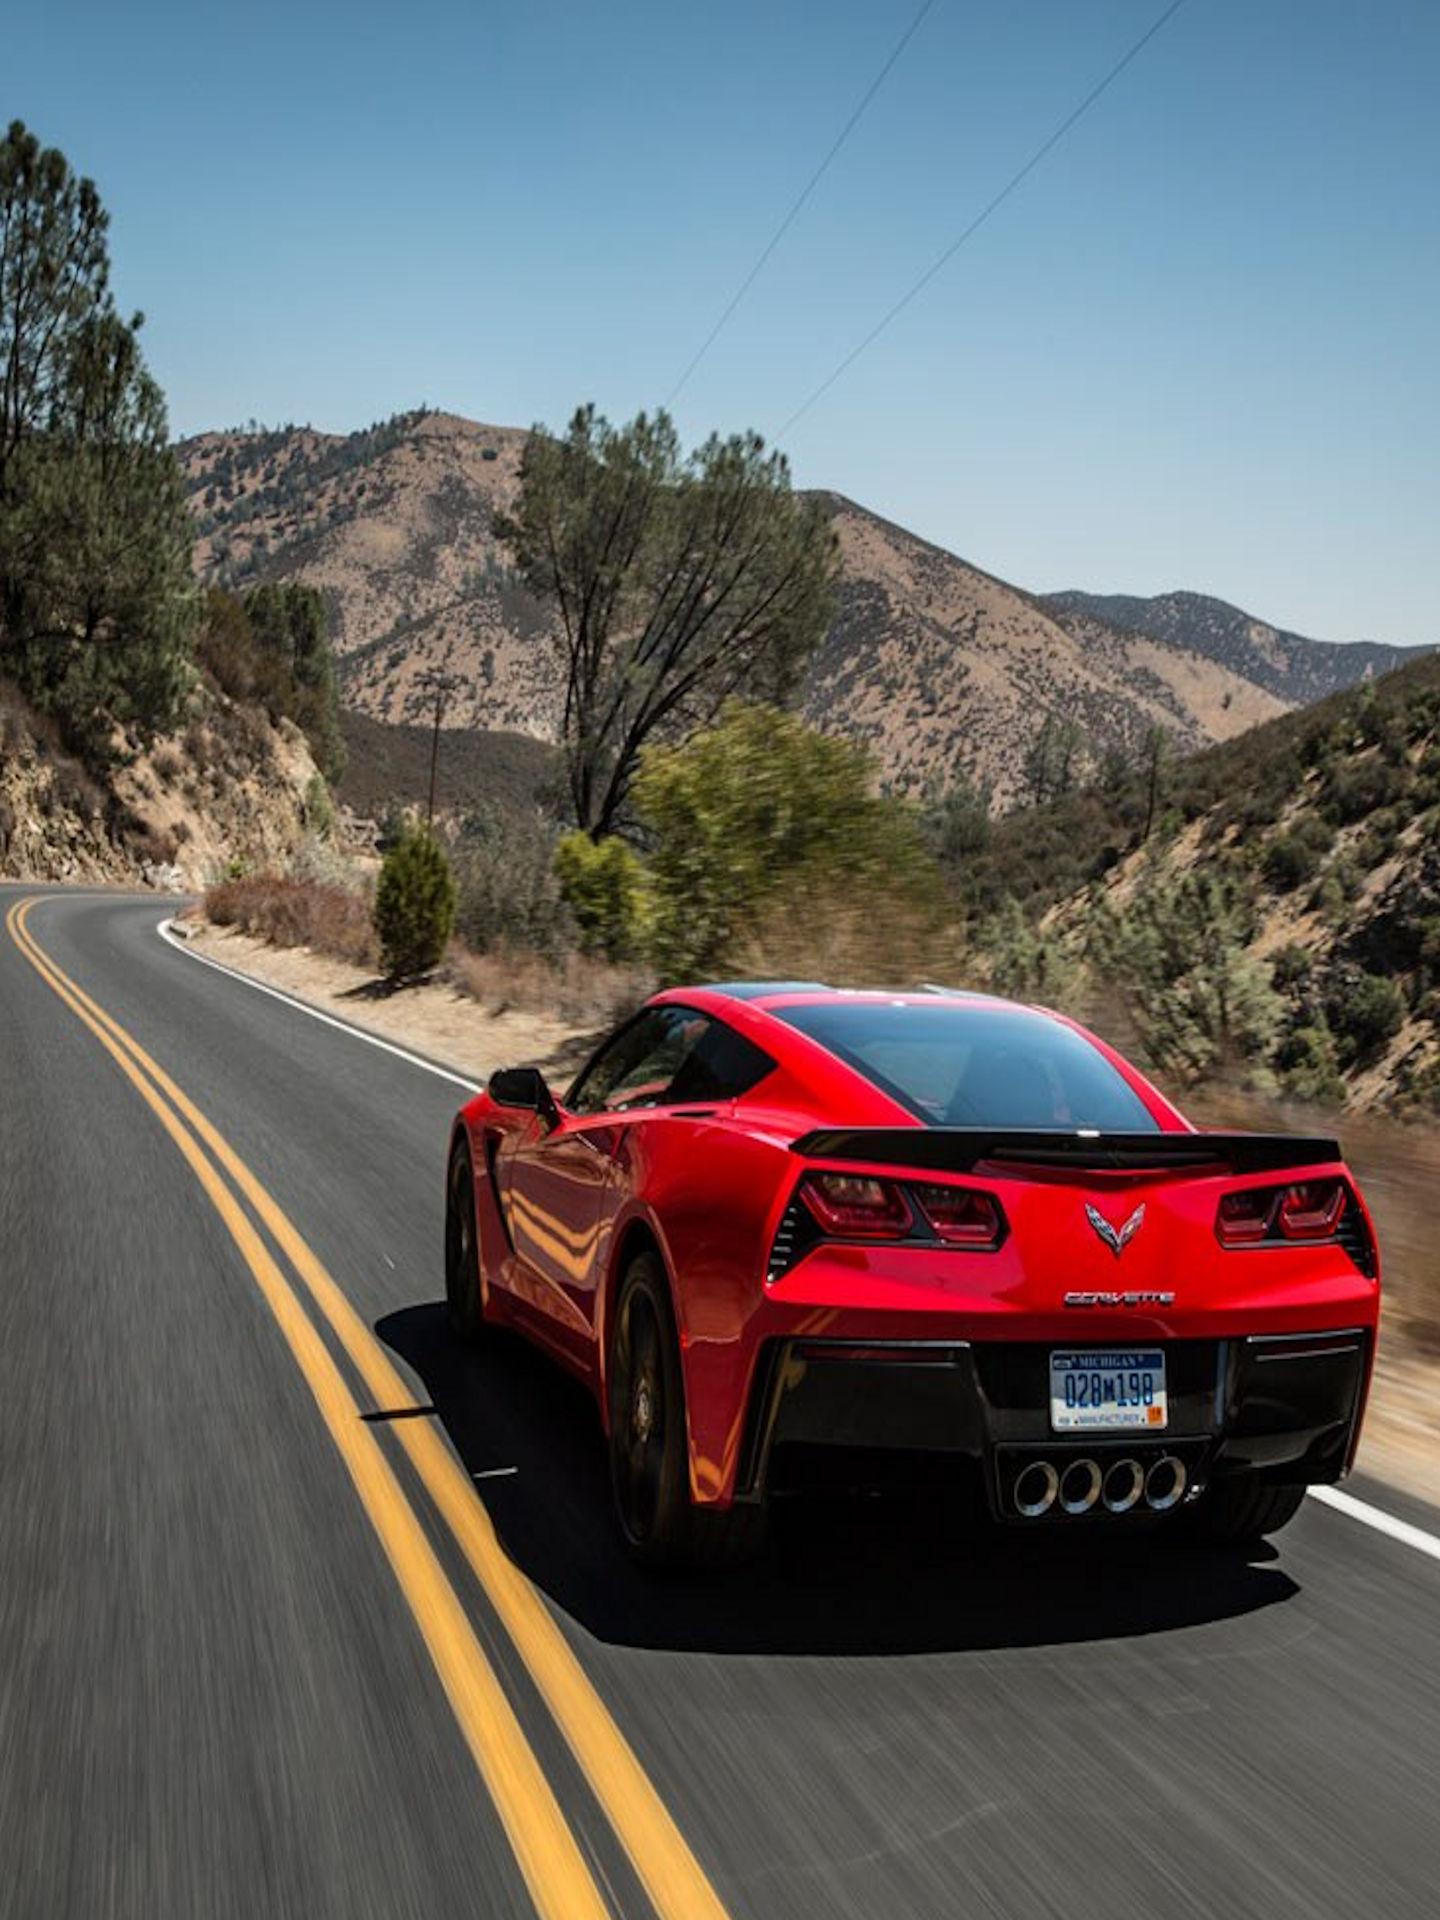 corvette_on_road_home